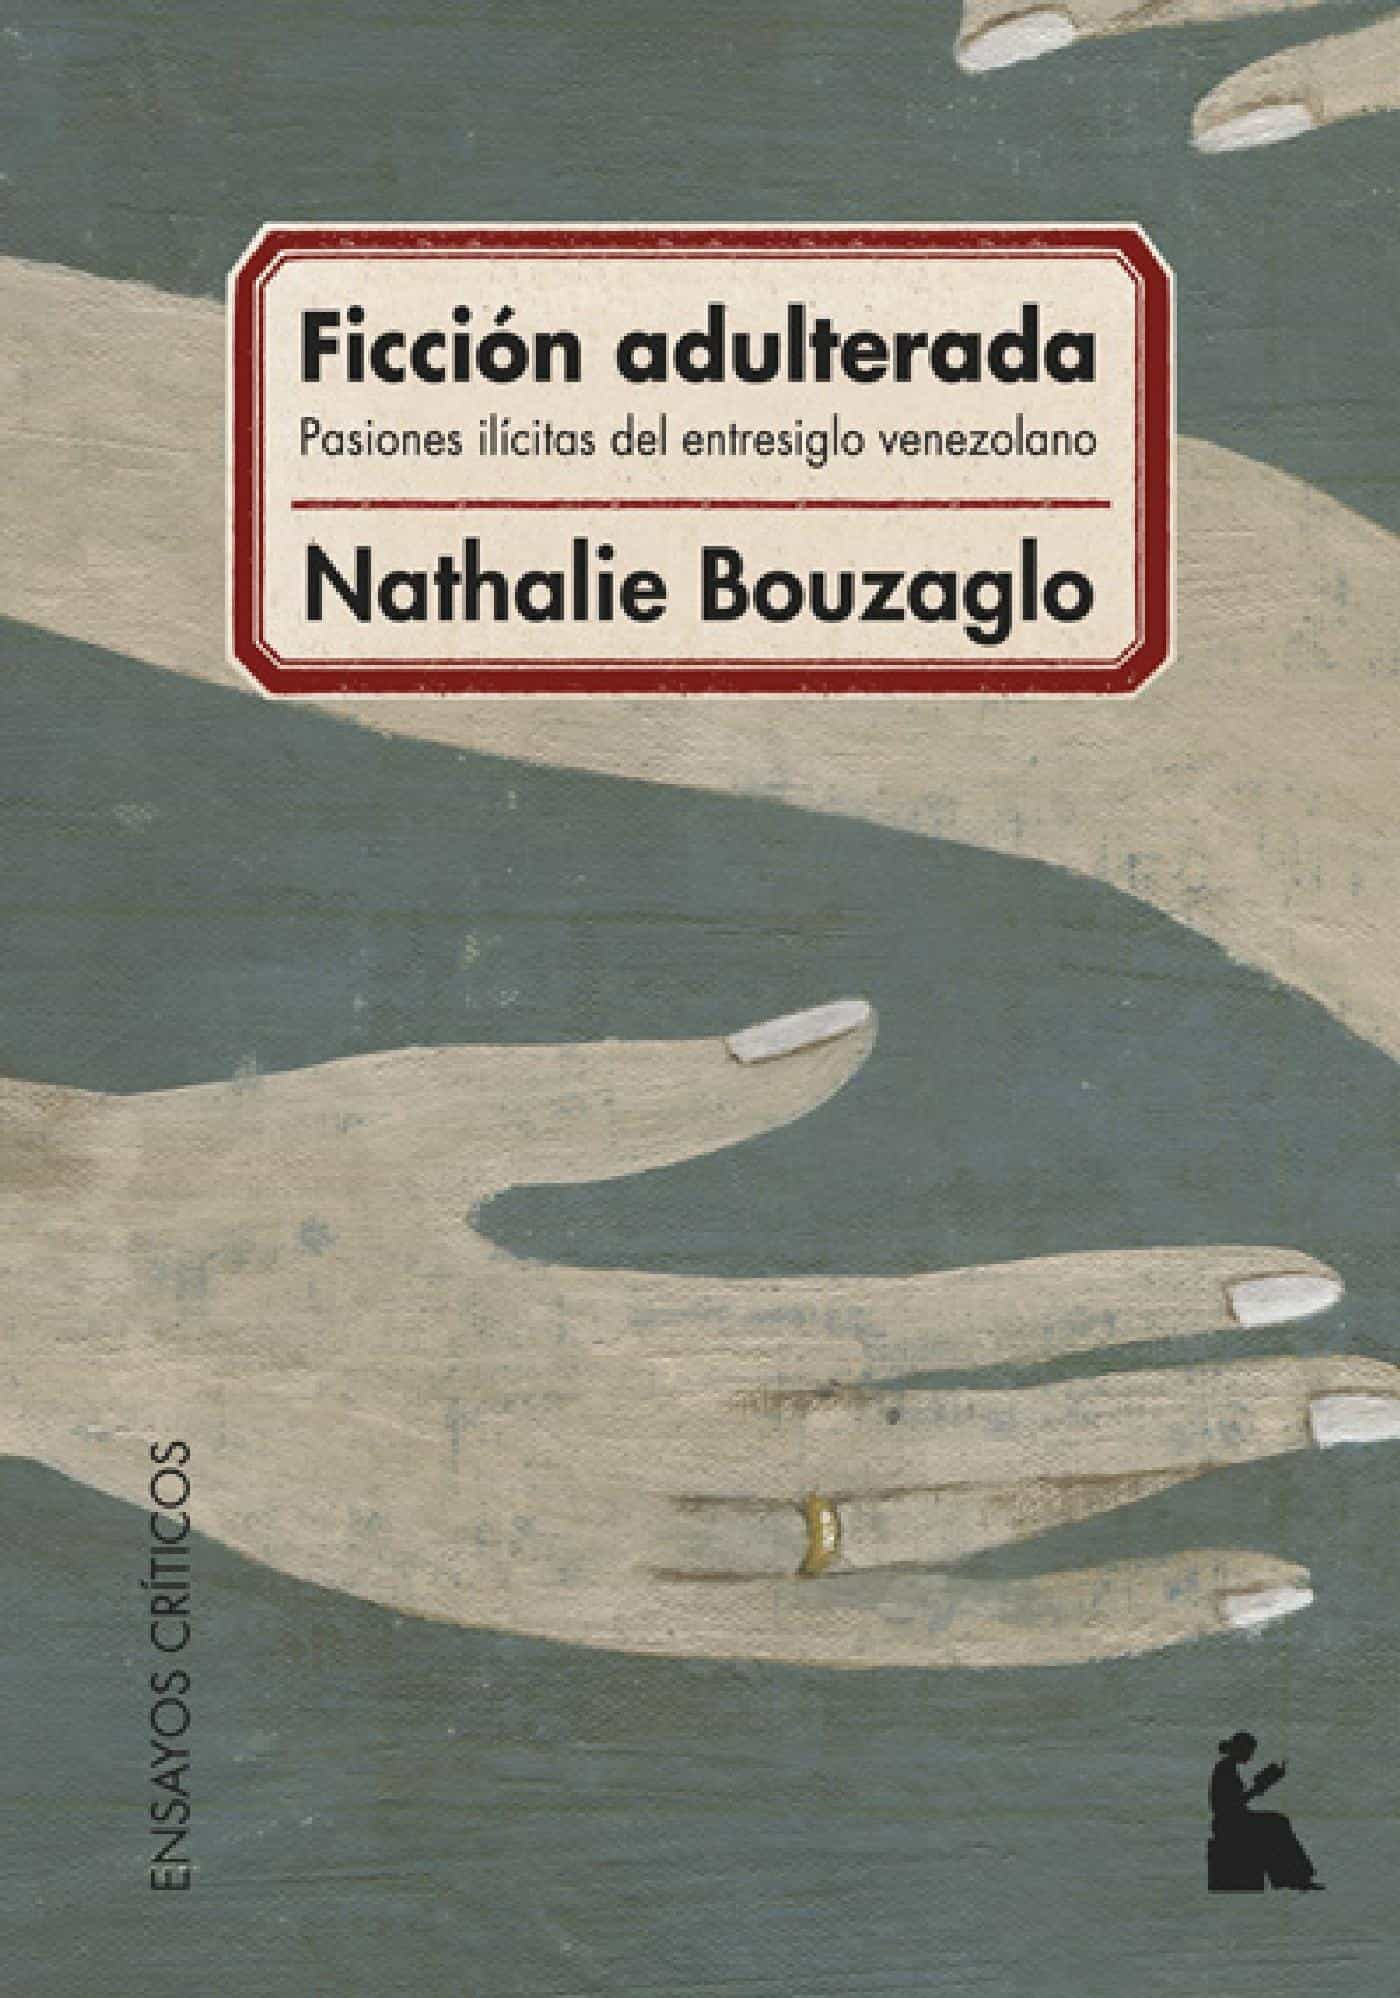 Ficción Adulterada Ebook Nathalie Bouzaglo Descargar Libro Pdf O